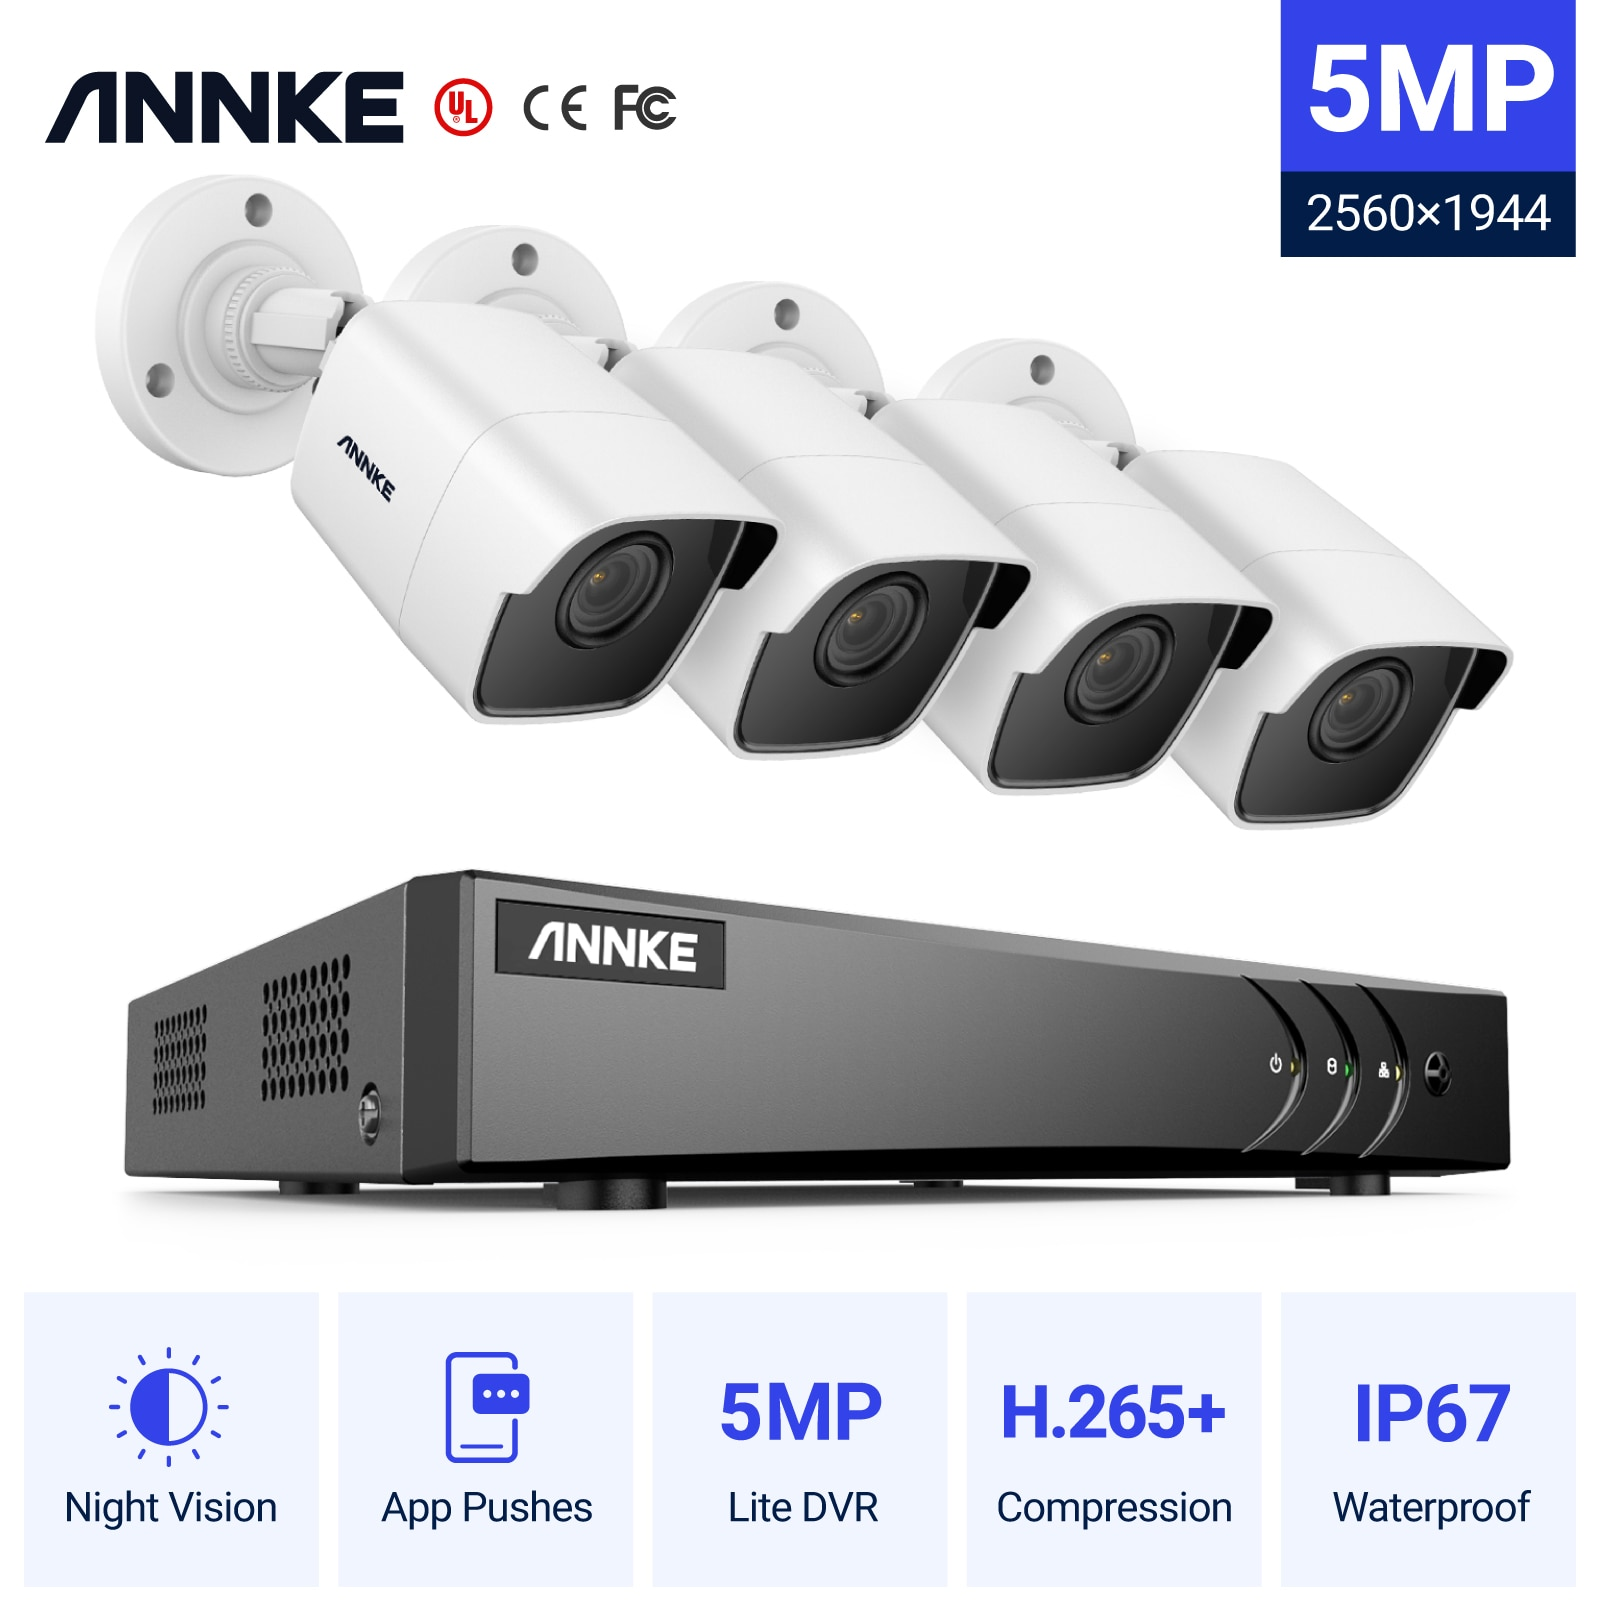 Система видеонаблюдения ANNKE, 4 канала, 5 Мп, 4 камеры